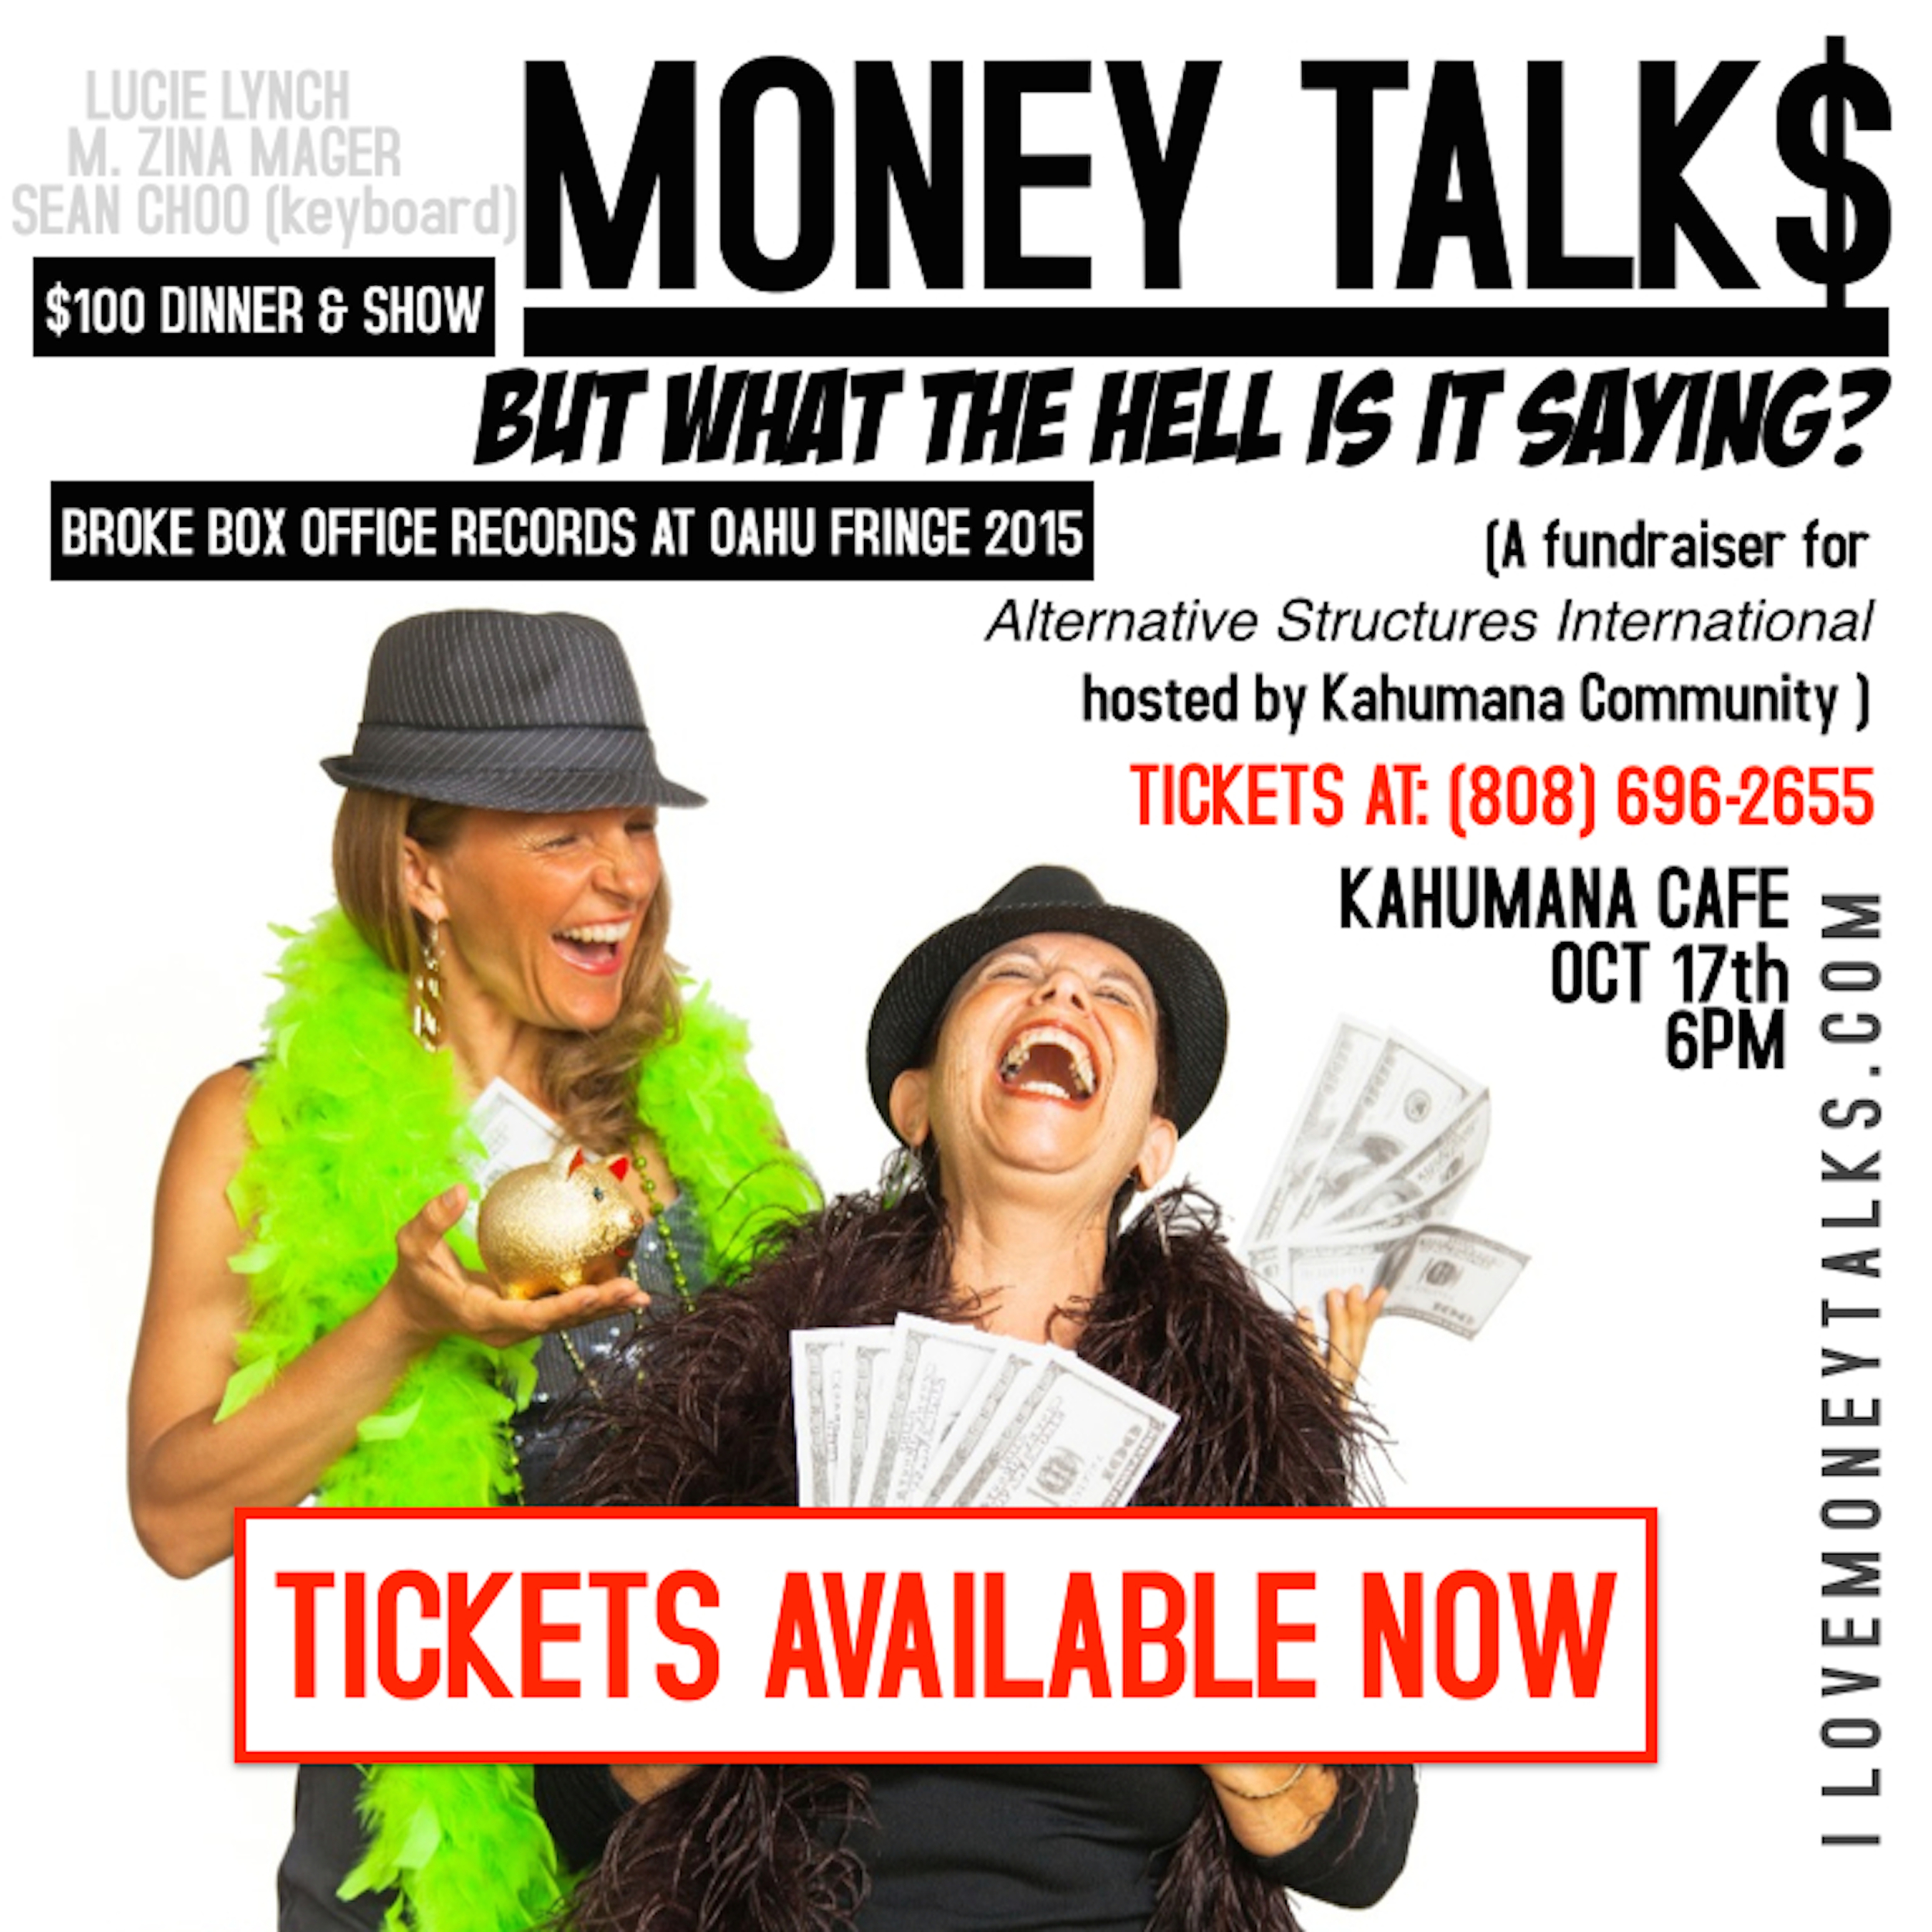 Events MONEY TALKS